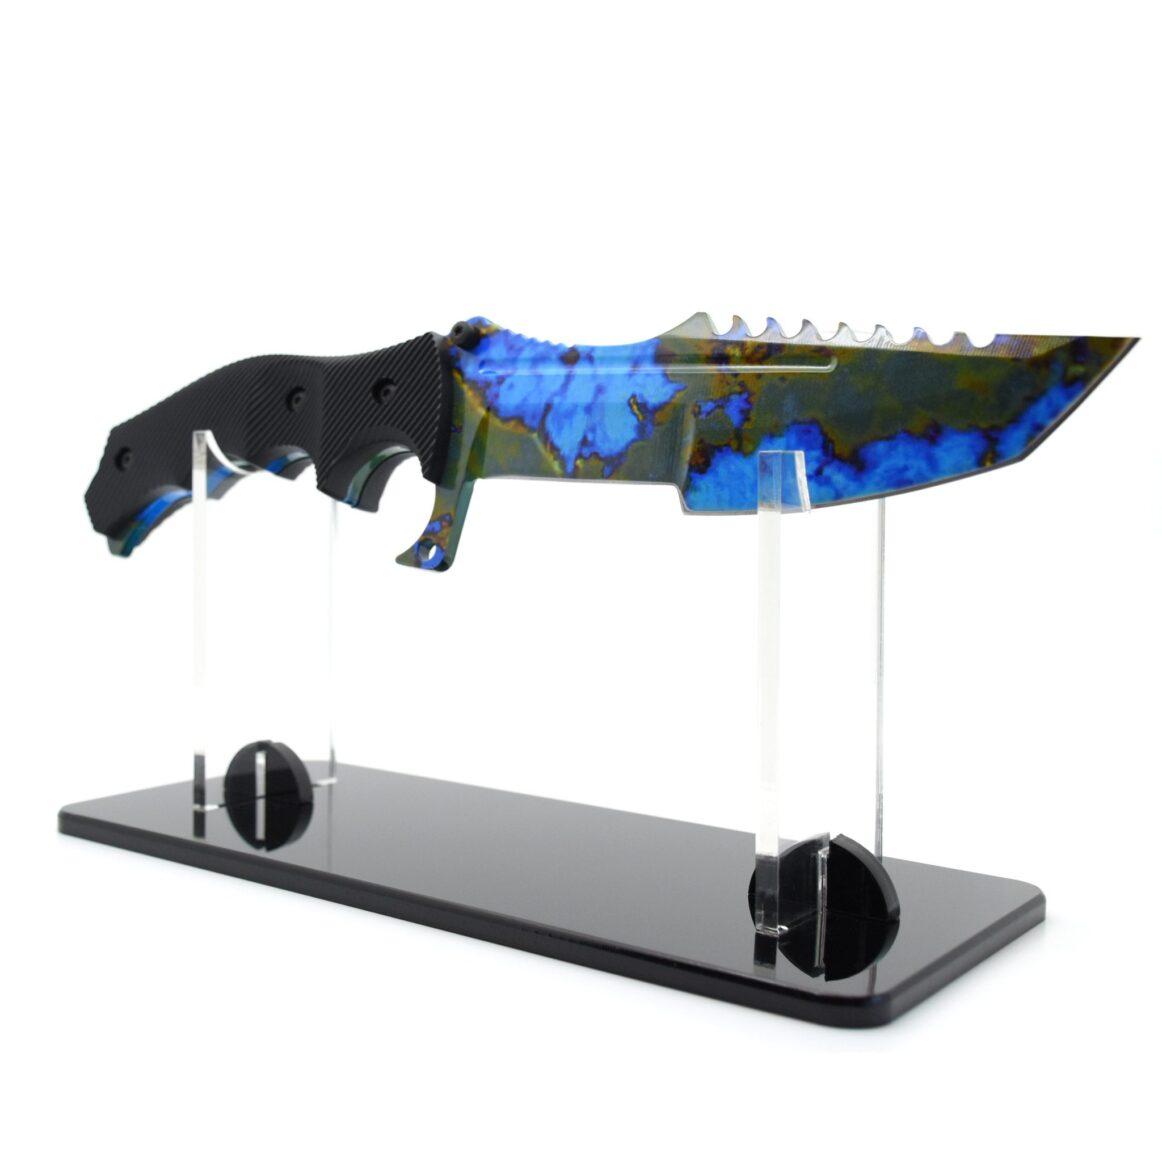 Display Stand Real CS:GO Huntsman Case Hardened - IRL CS GO Knife